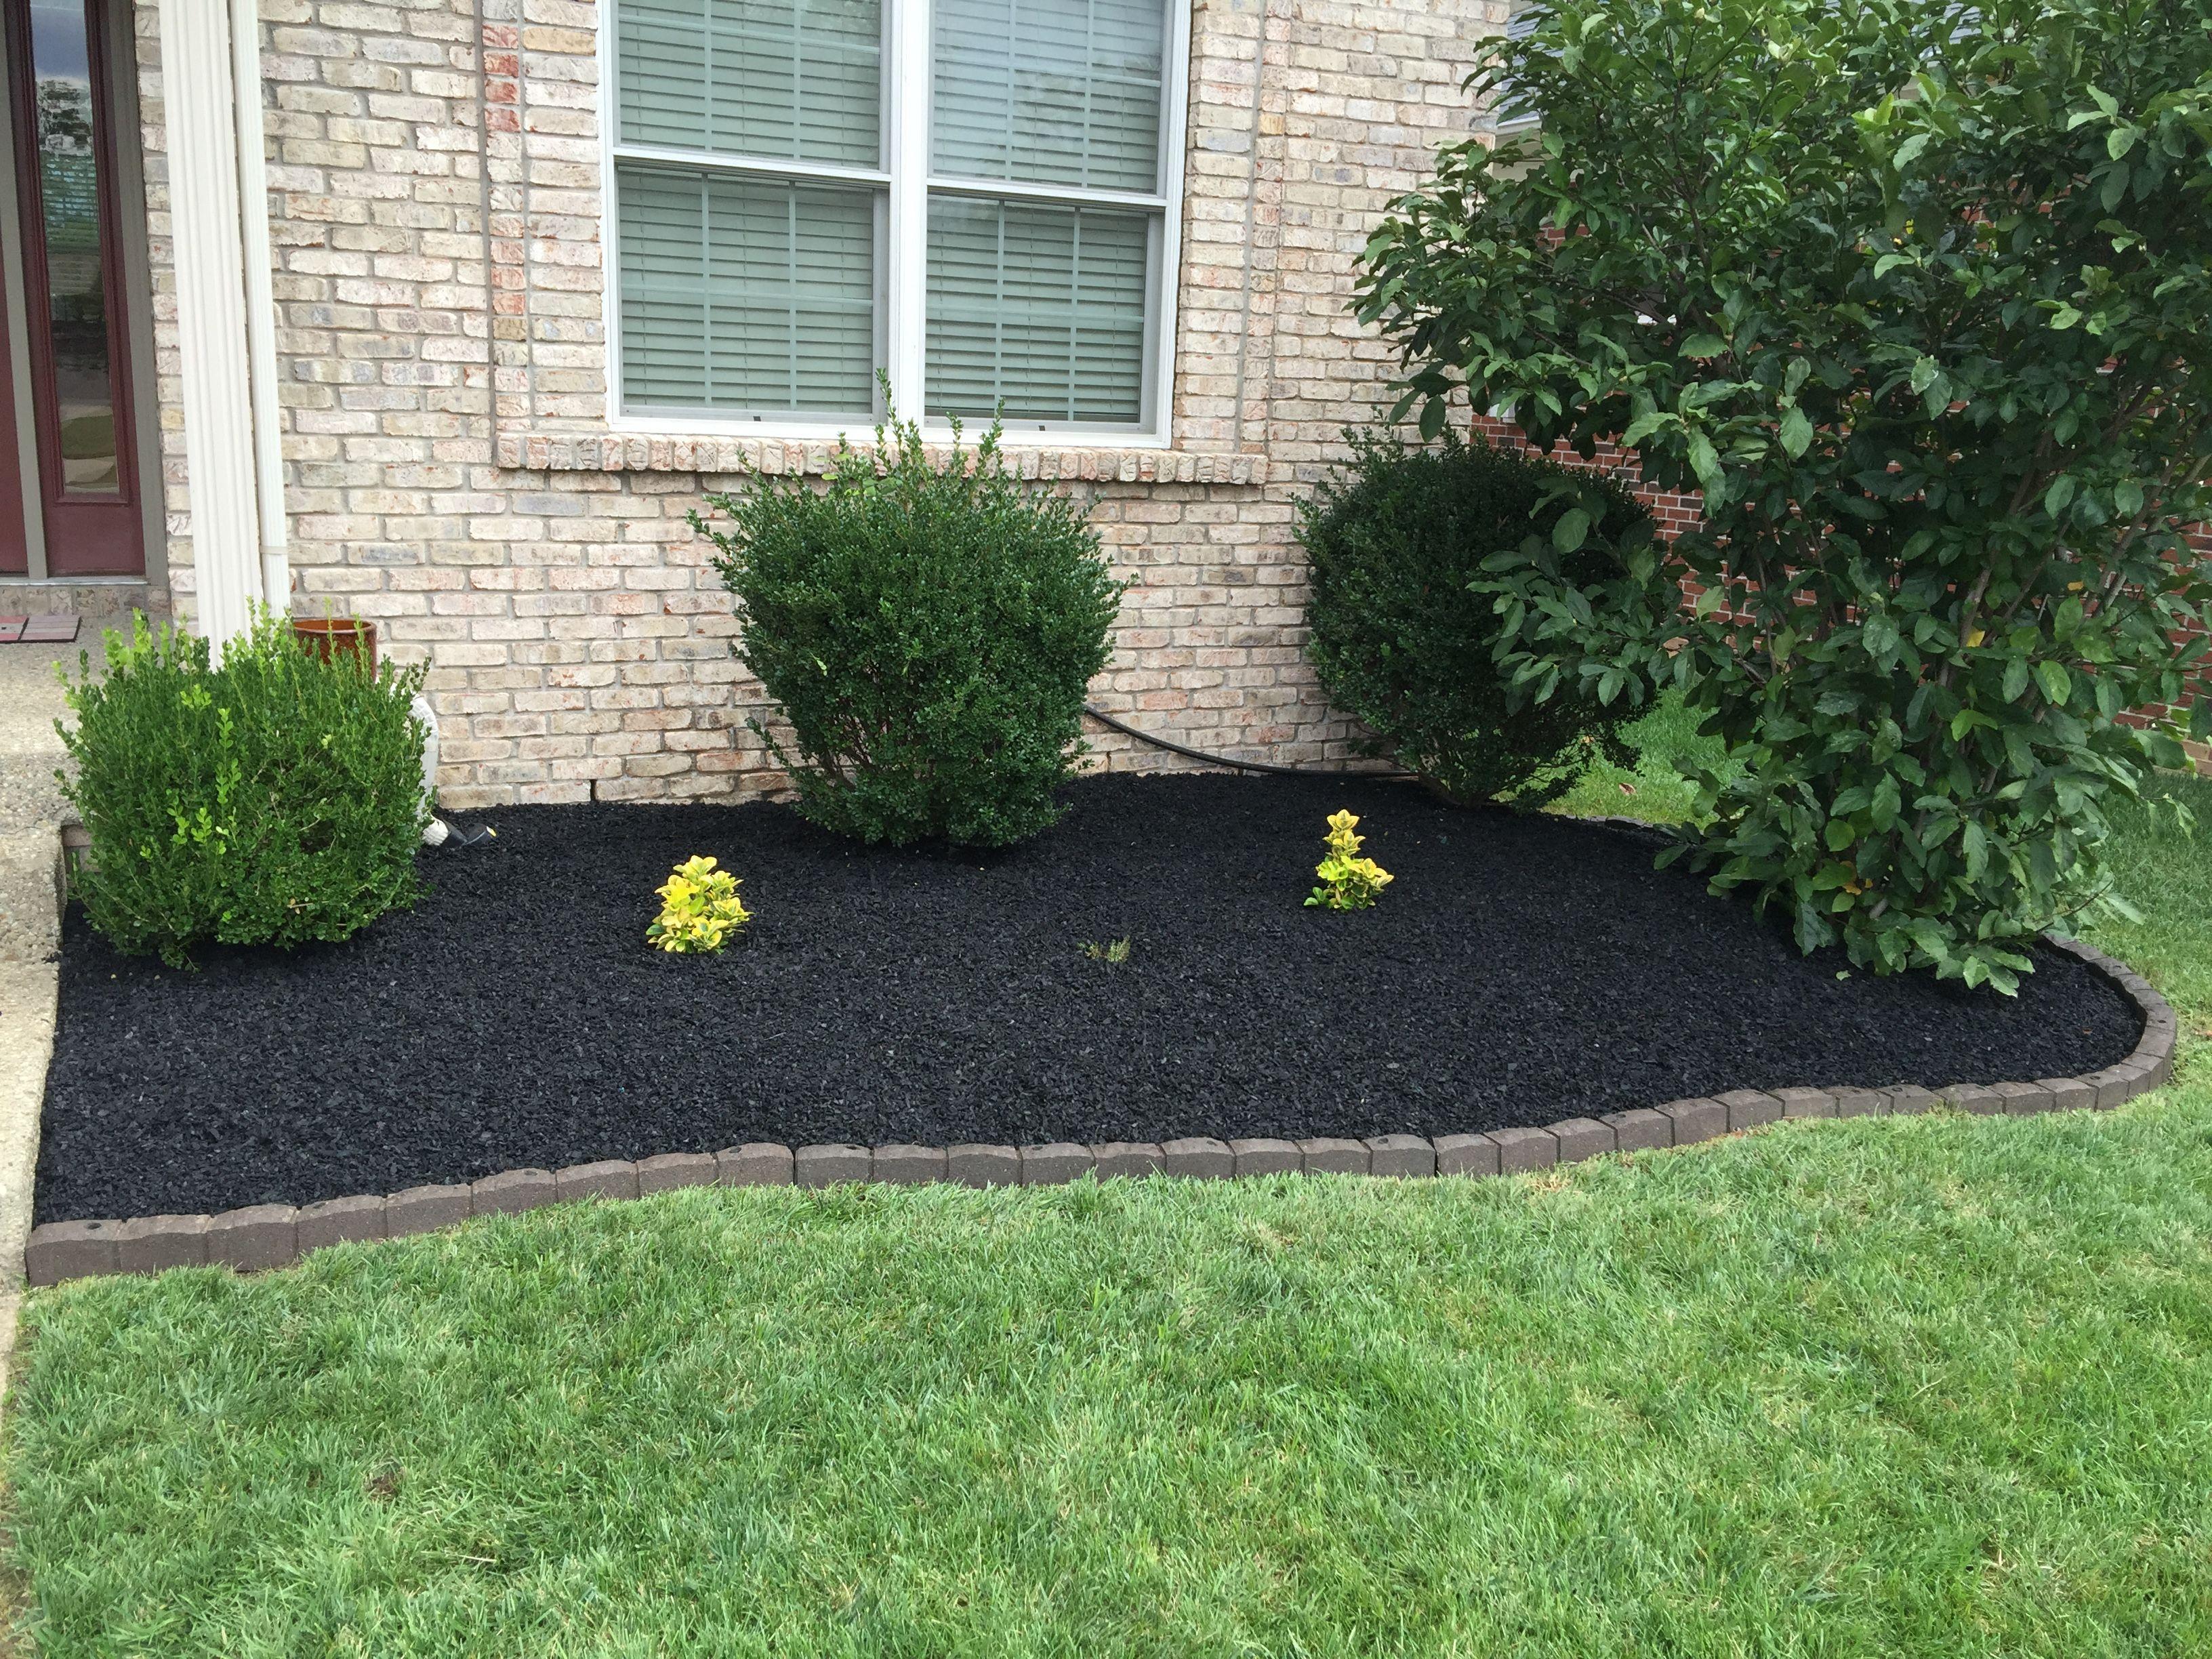 rubber mulch prevent weeds